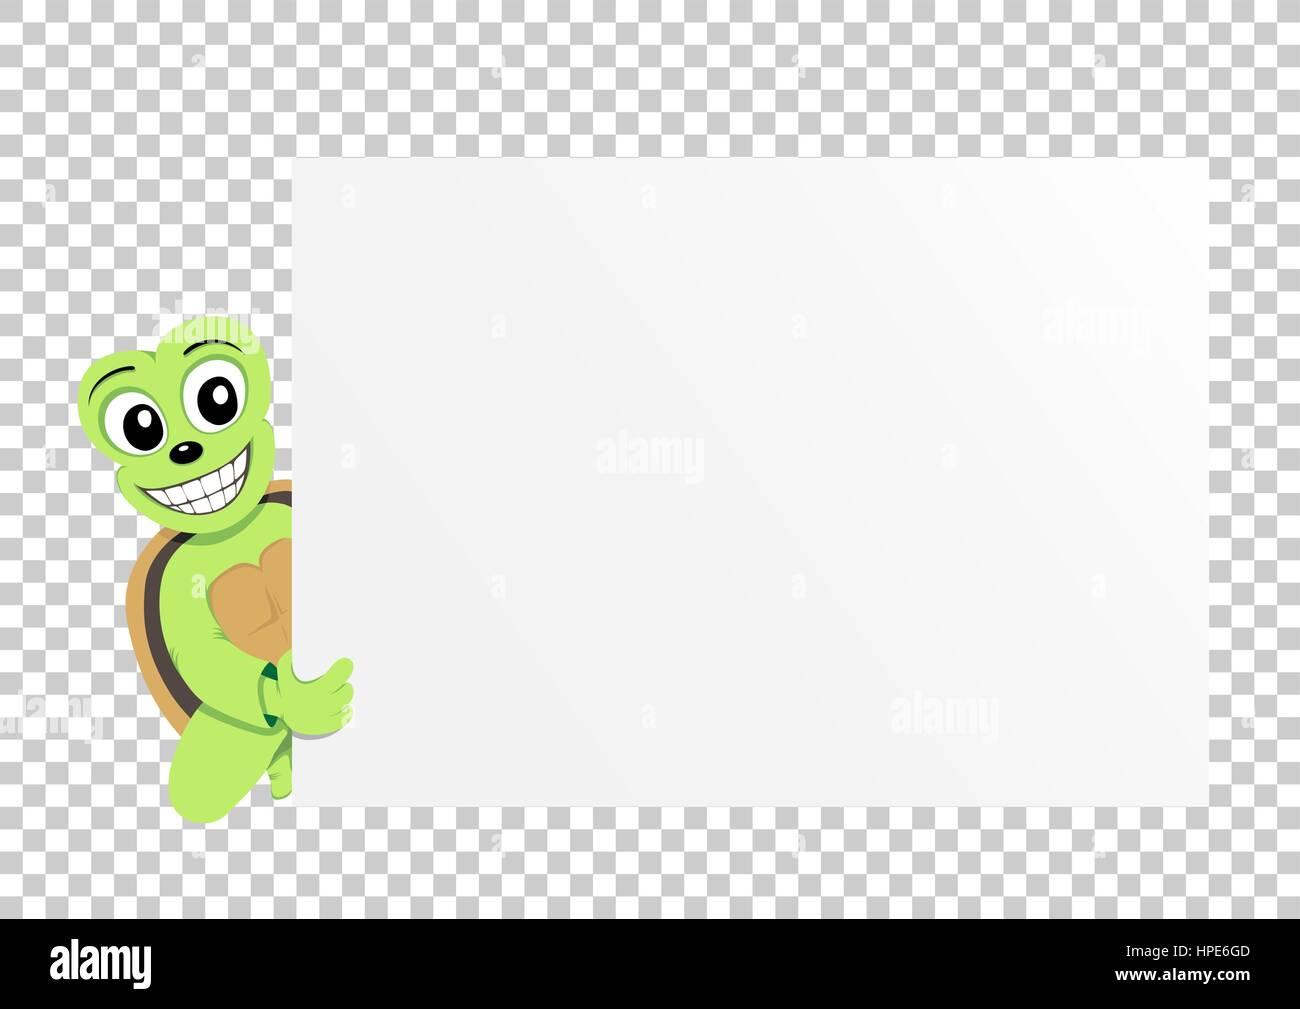 turtle paper transparent - Stock Image